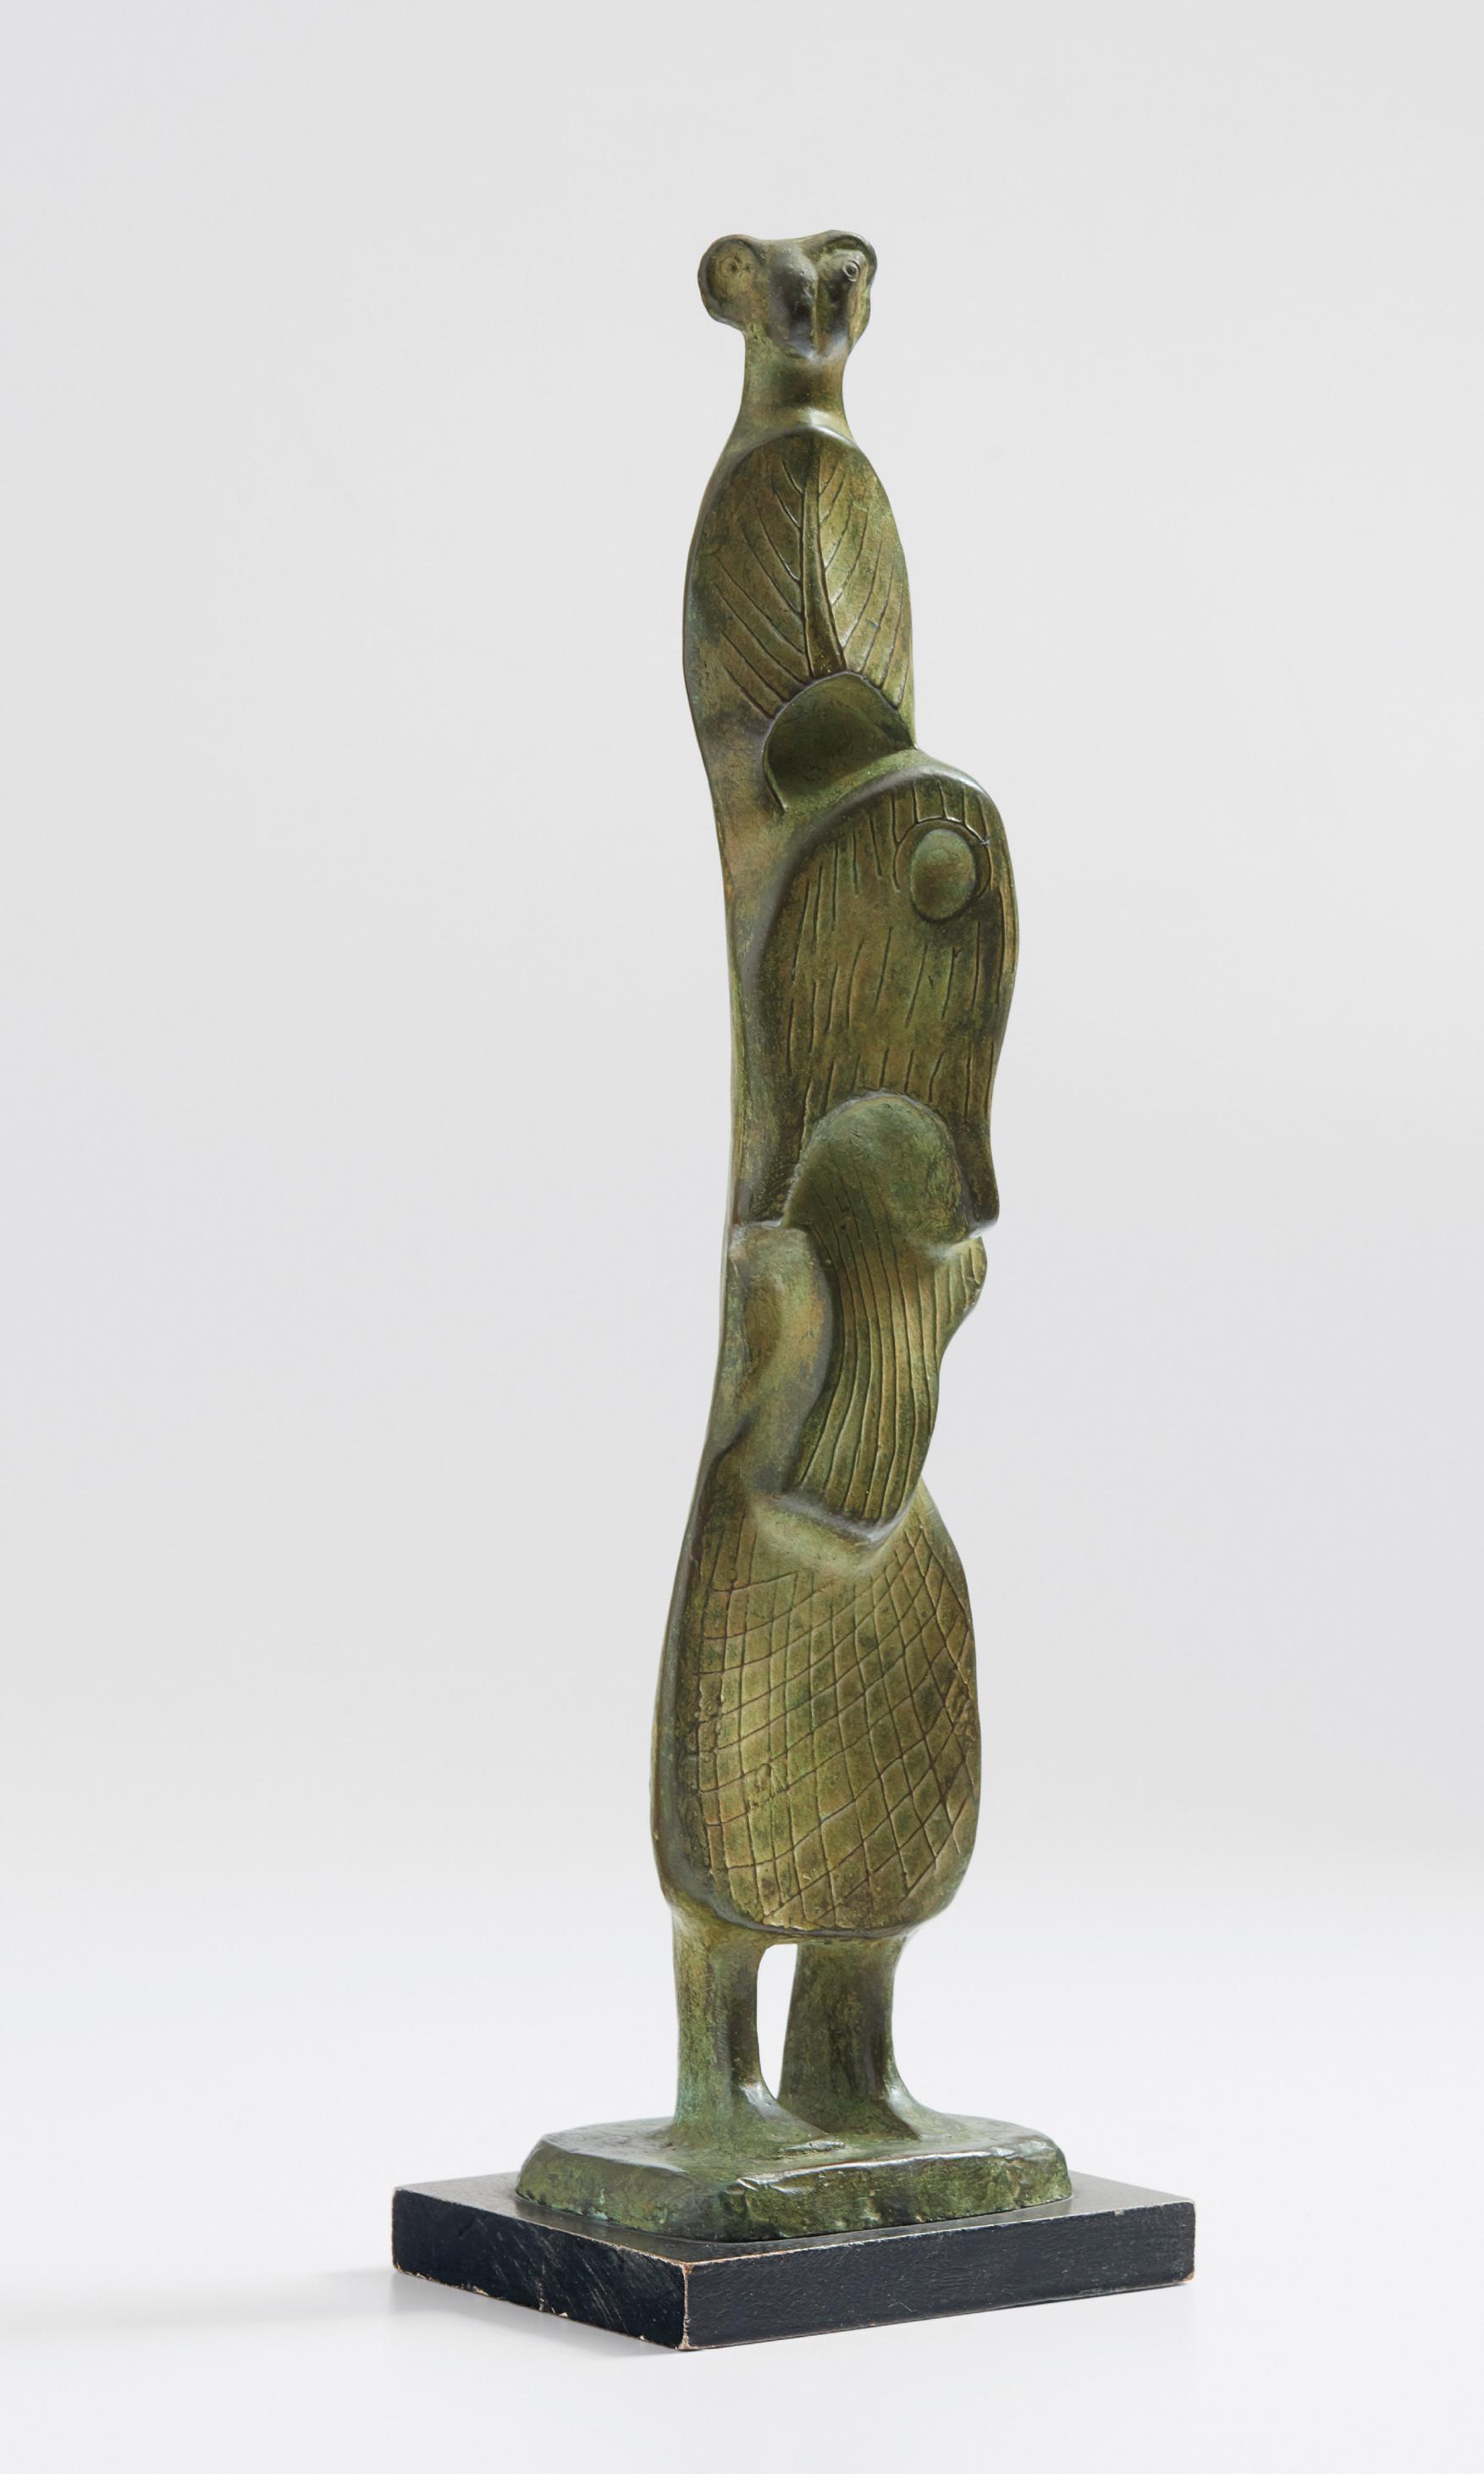 Henry Moore-Leaf Figure No. 4-1952